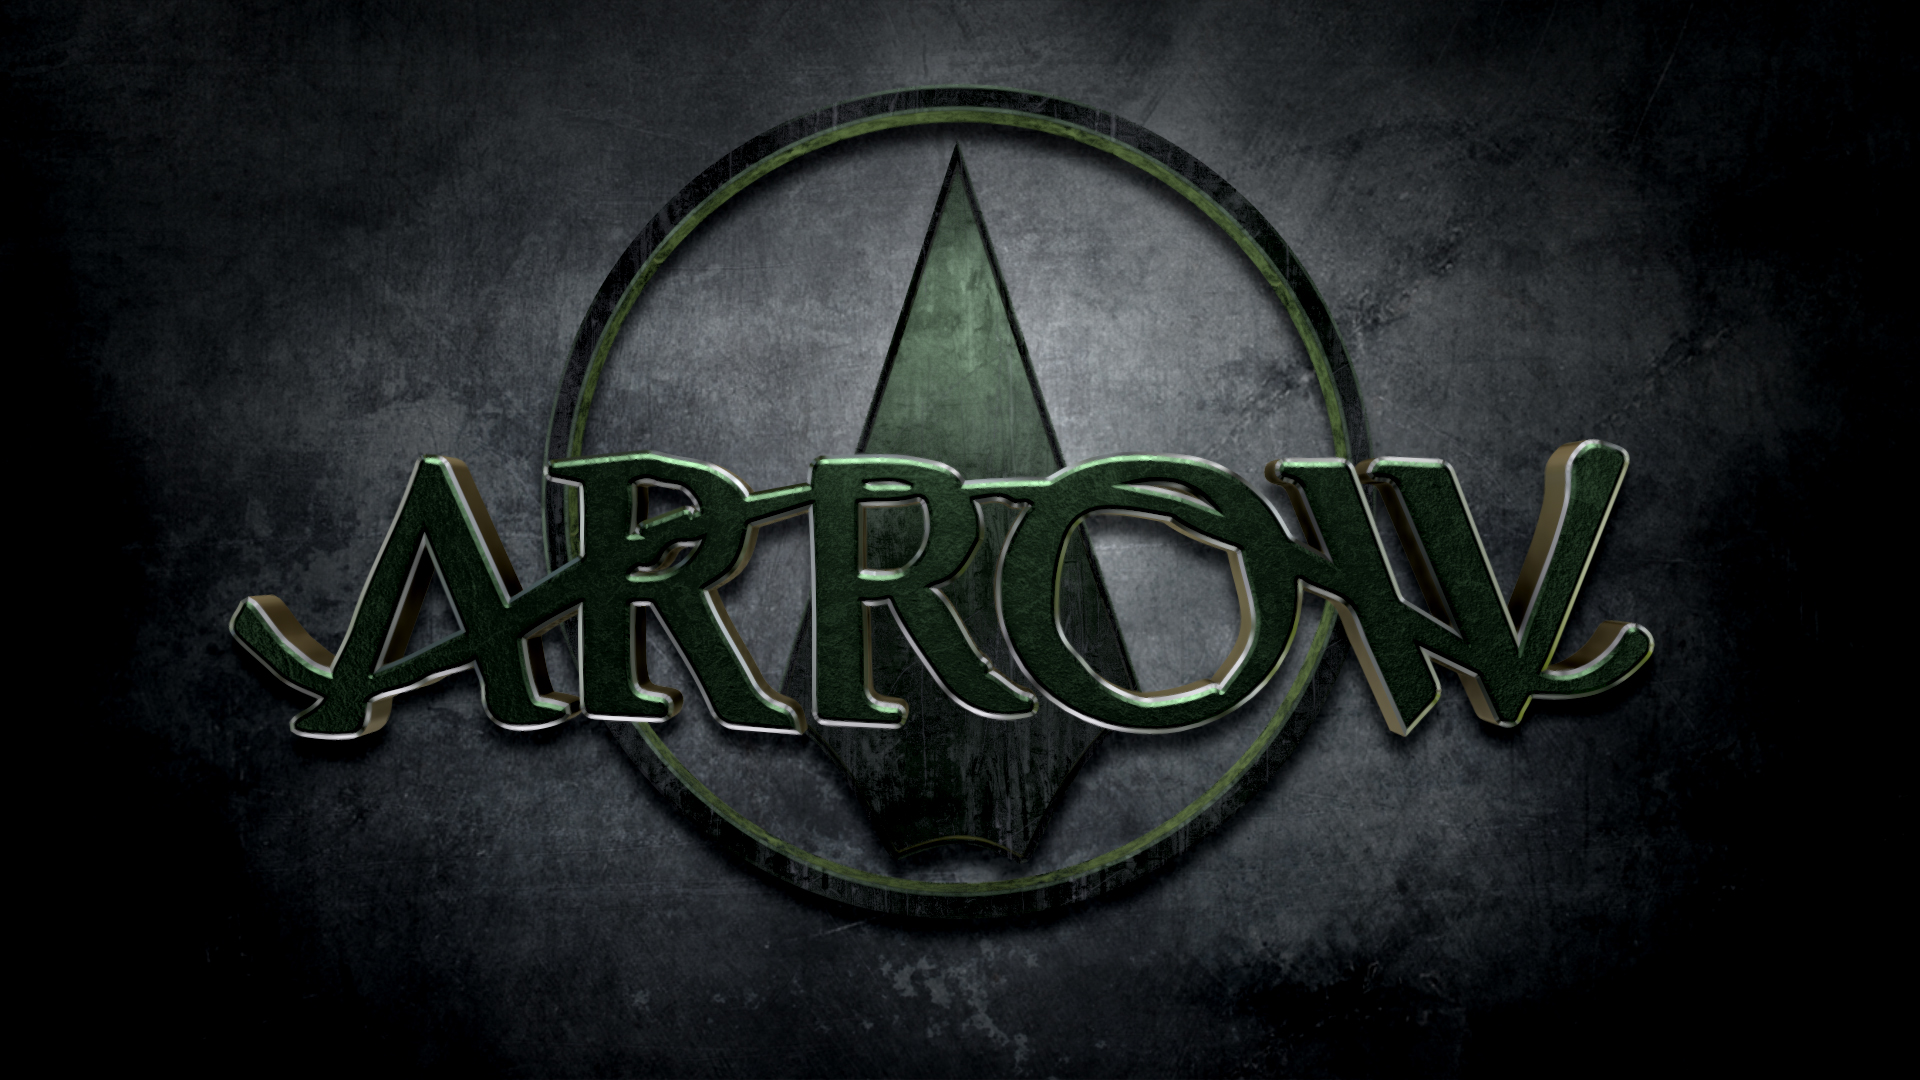 Good Wallpaper Movie Arrow - Cw-Arrow-Iphone-Wallpaper-Arrow-cw-logo-iphone-wallpaper  Trends_37133.jpg